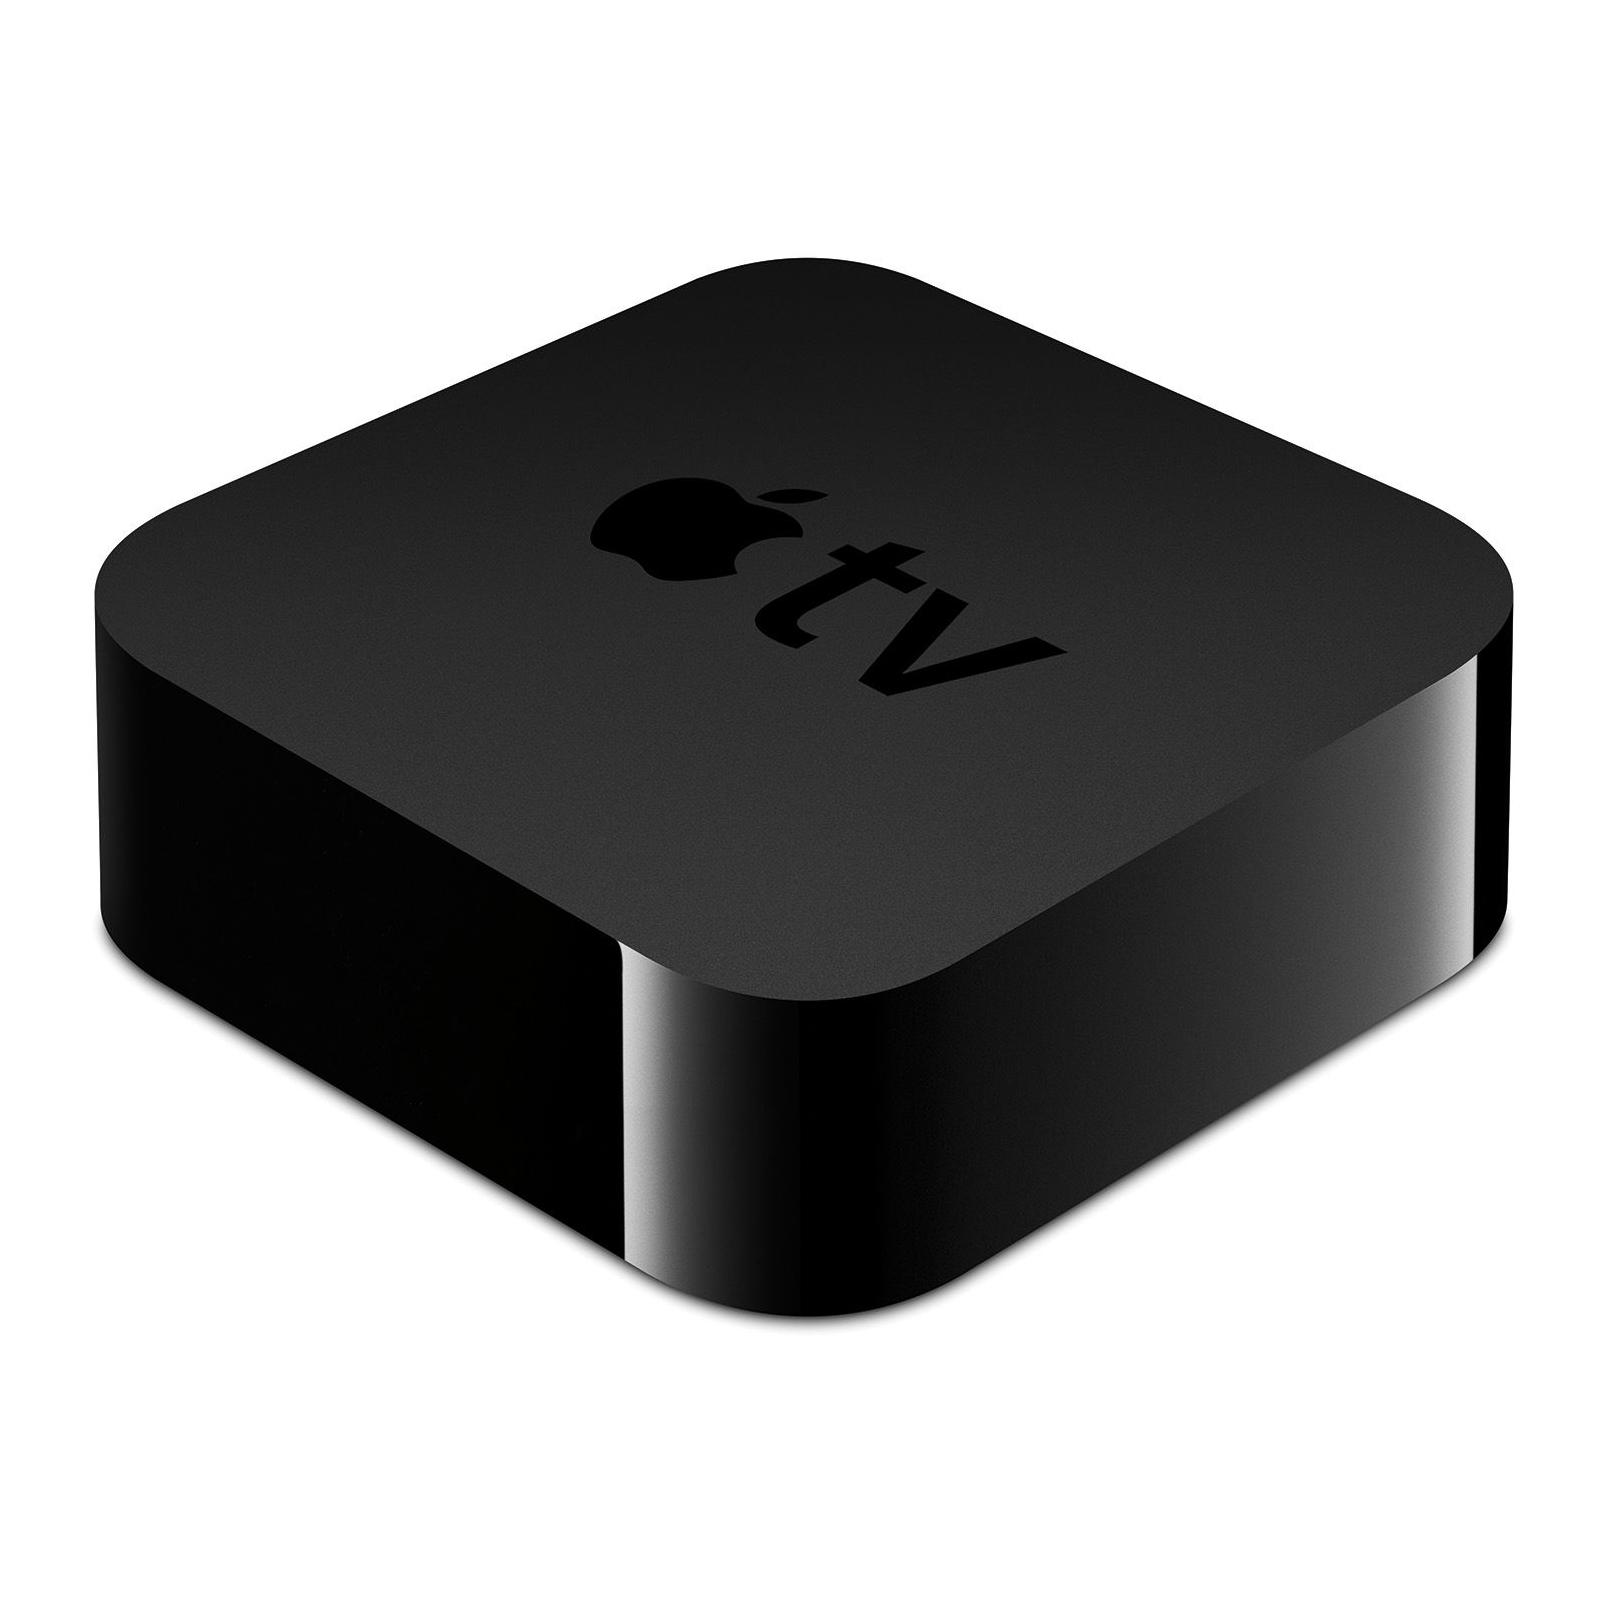 Медиаплеер Apple TV A1625 64GB (MLNC2RS/A) изображение 3